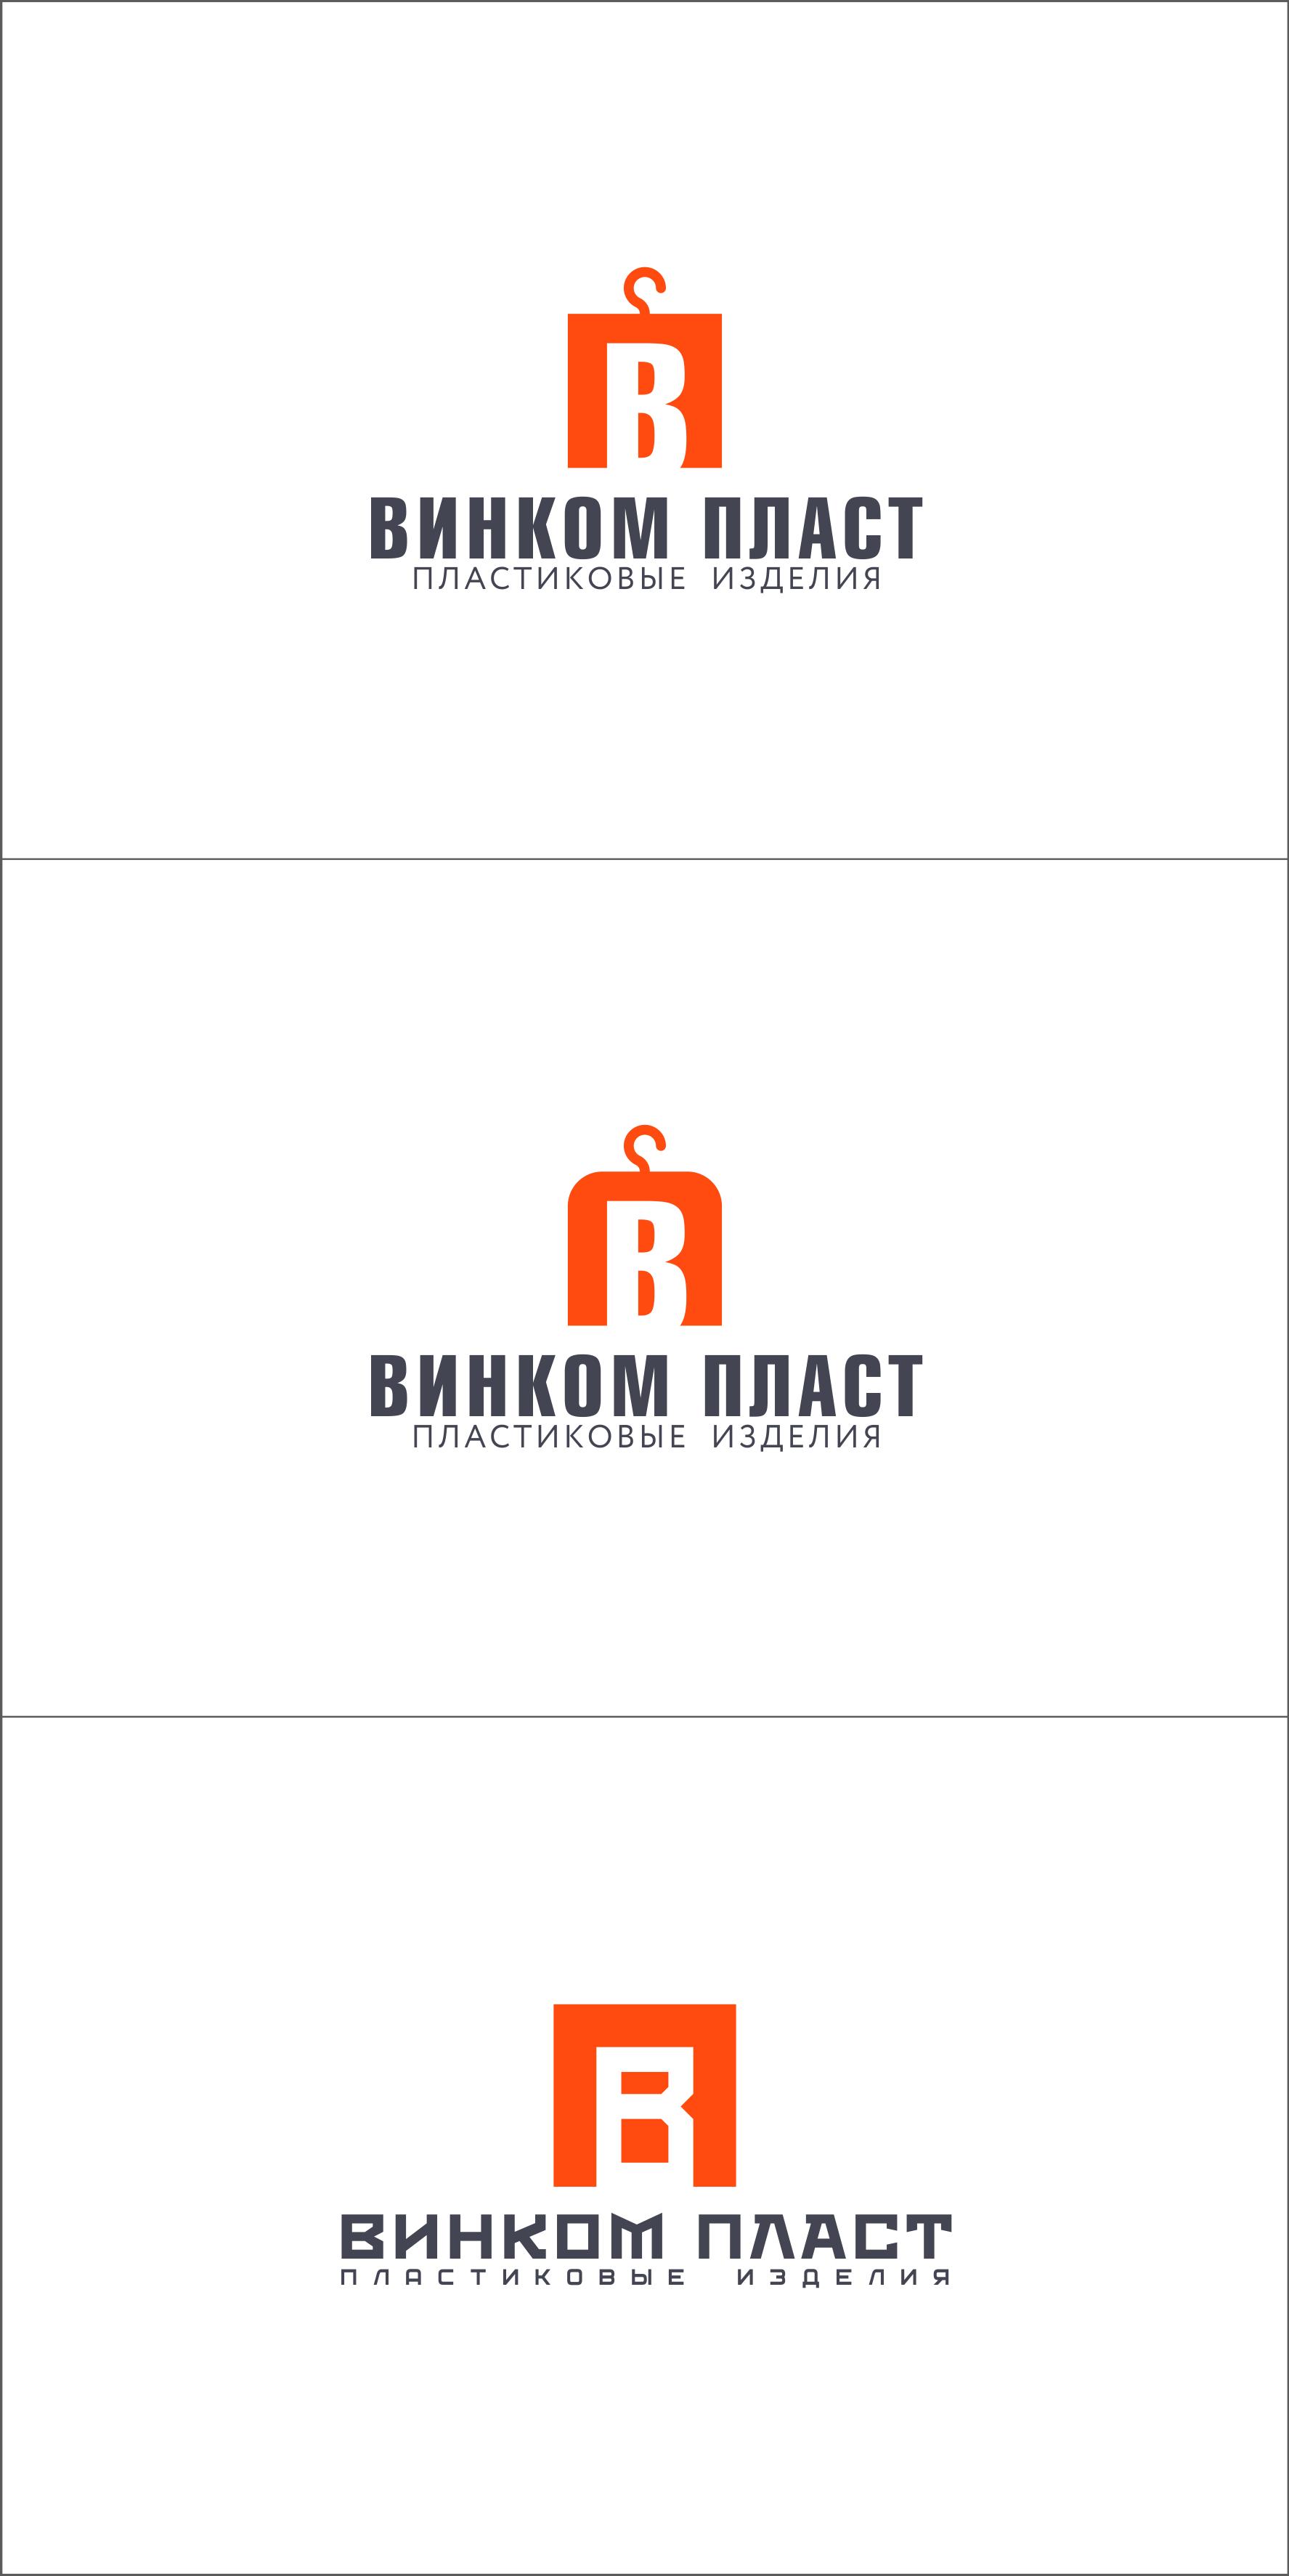 Логотип, фавикон и визитка для компании Винком Пласт  фото f_4965c40859e06b7c.png